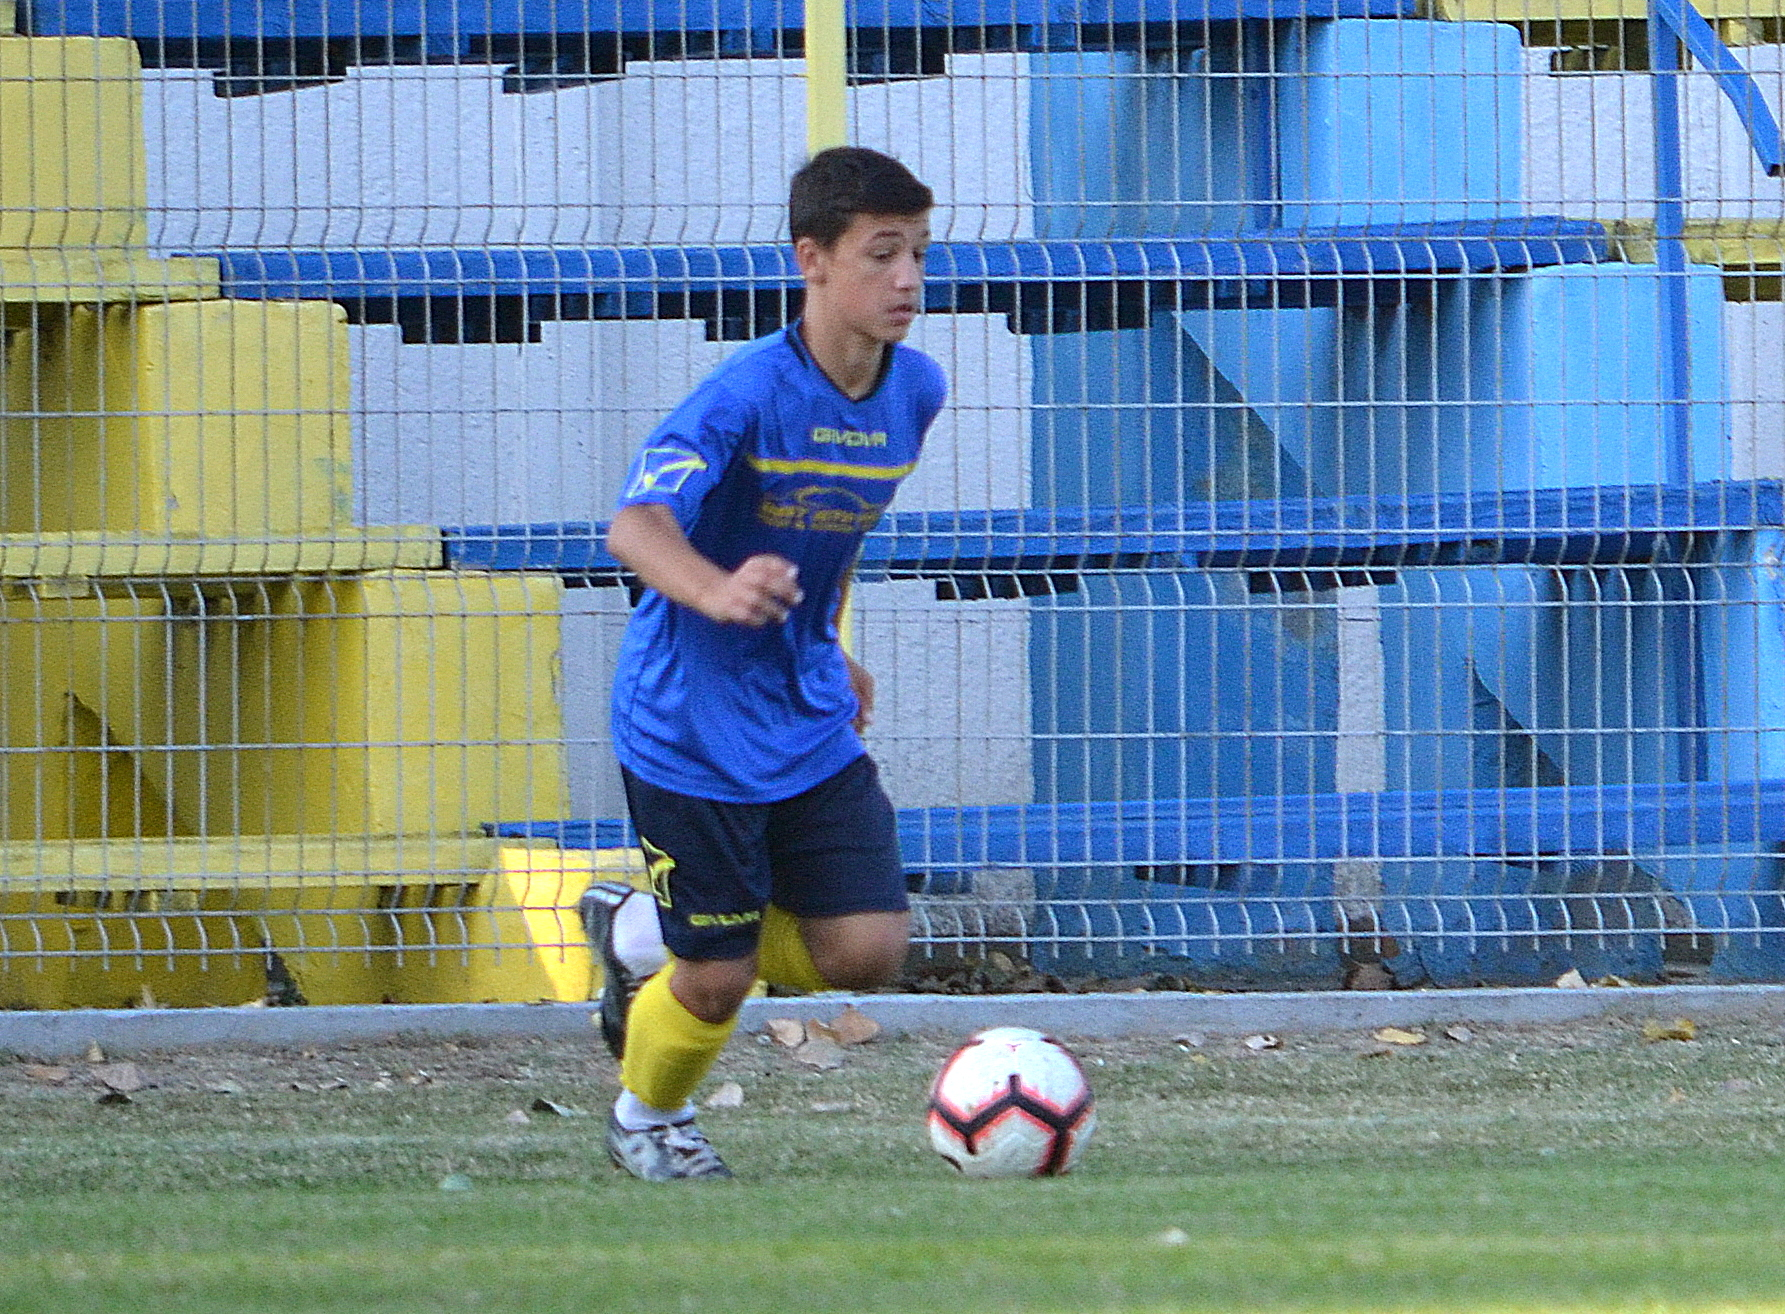 Junior pecican, convocat la lotul național de fotbal